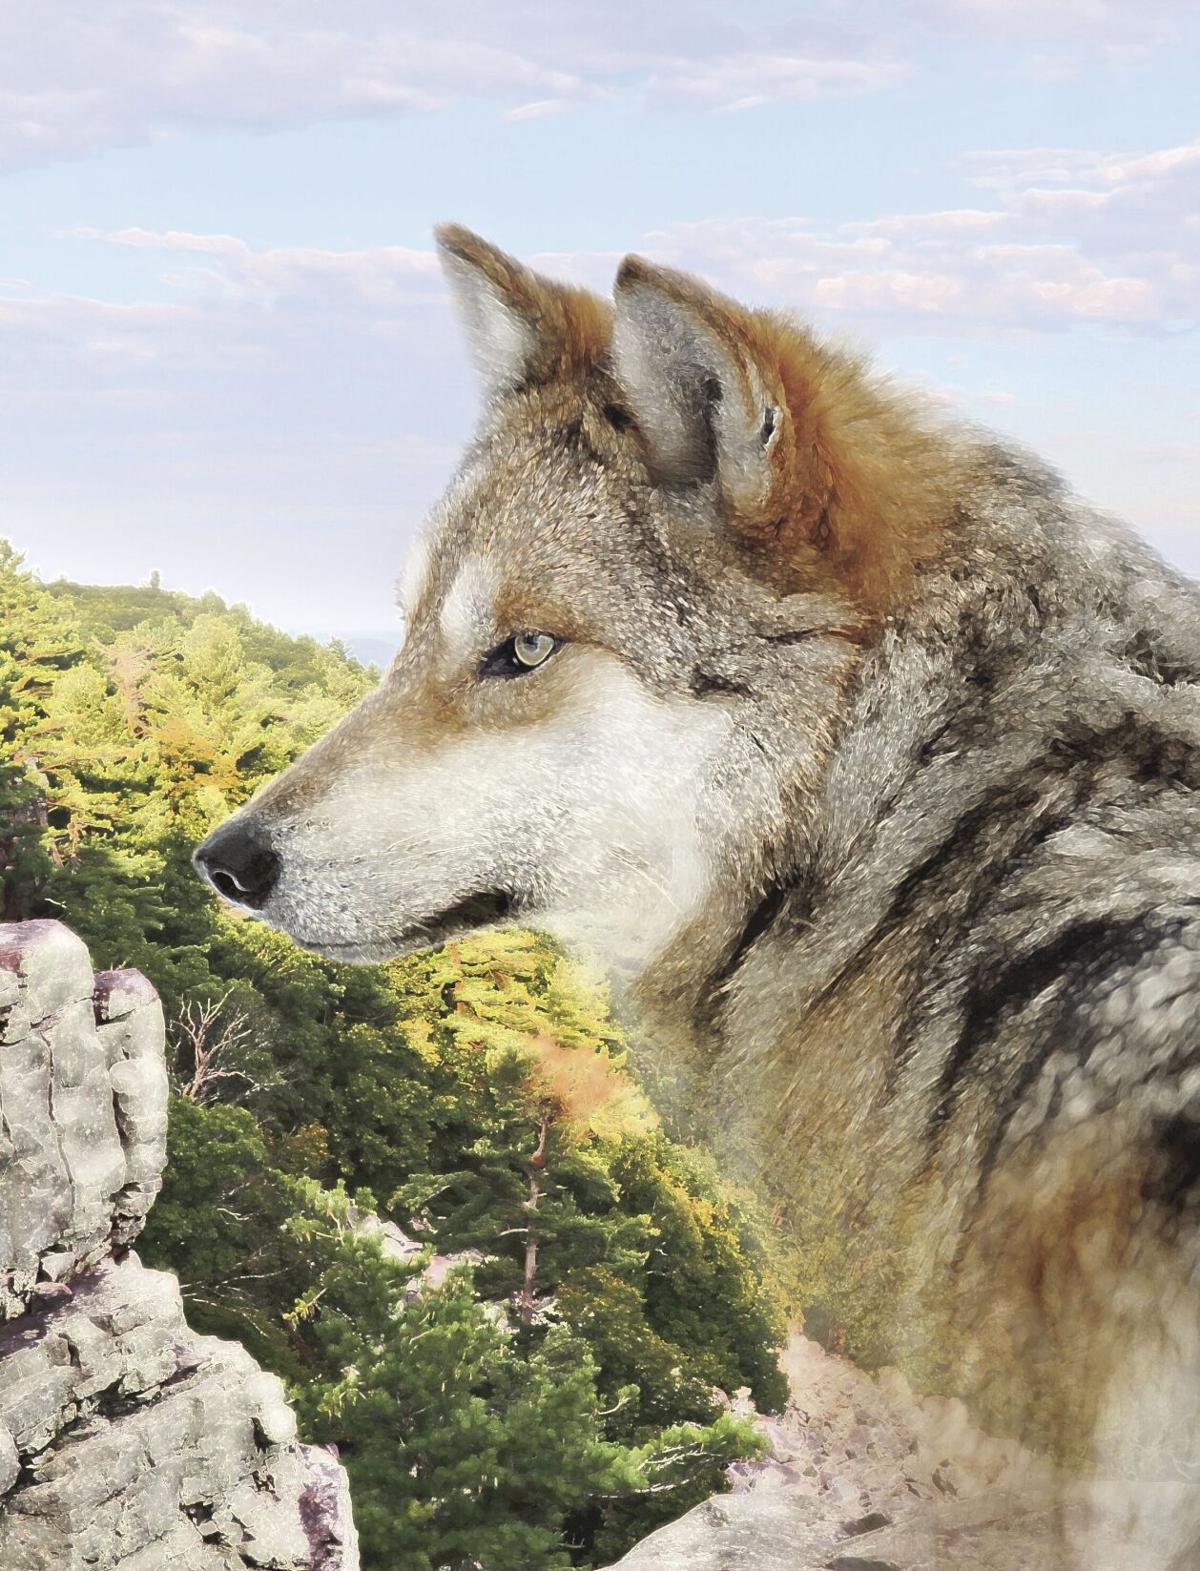 wolves intro image 3 MKE.tif